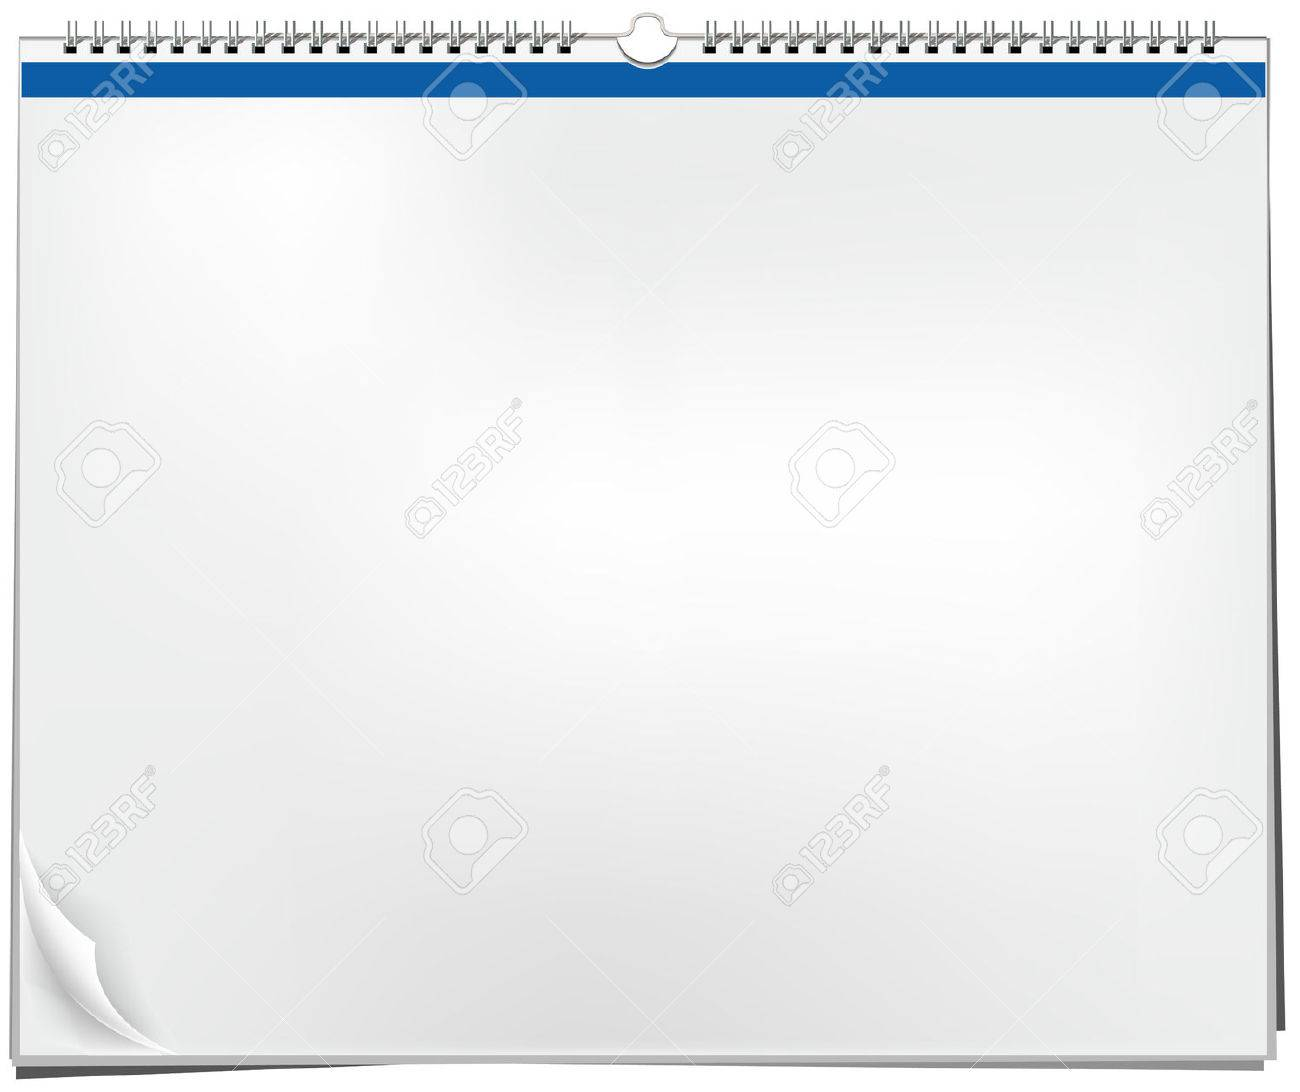 Blank wall calendar with spring - 8769949